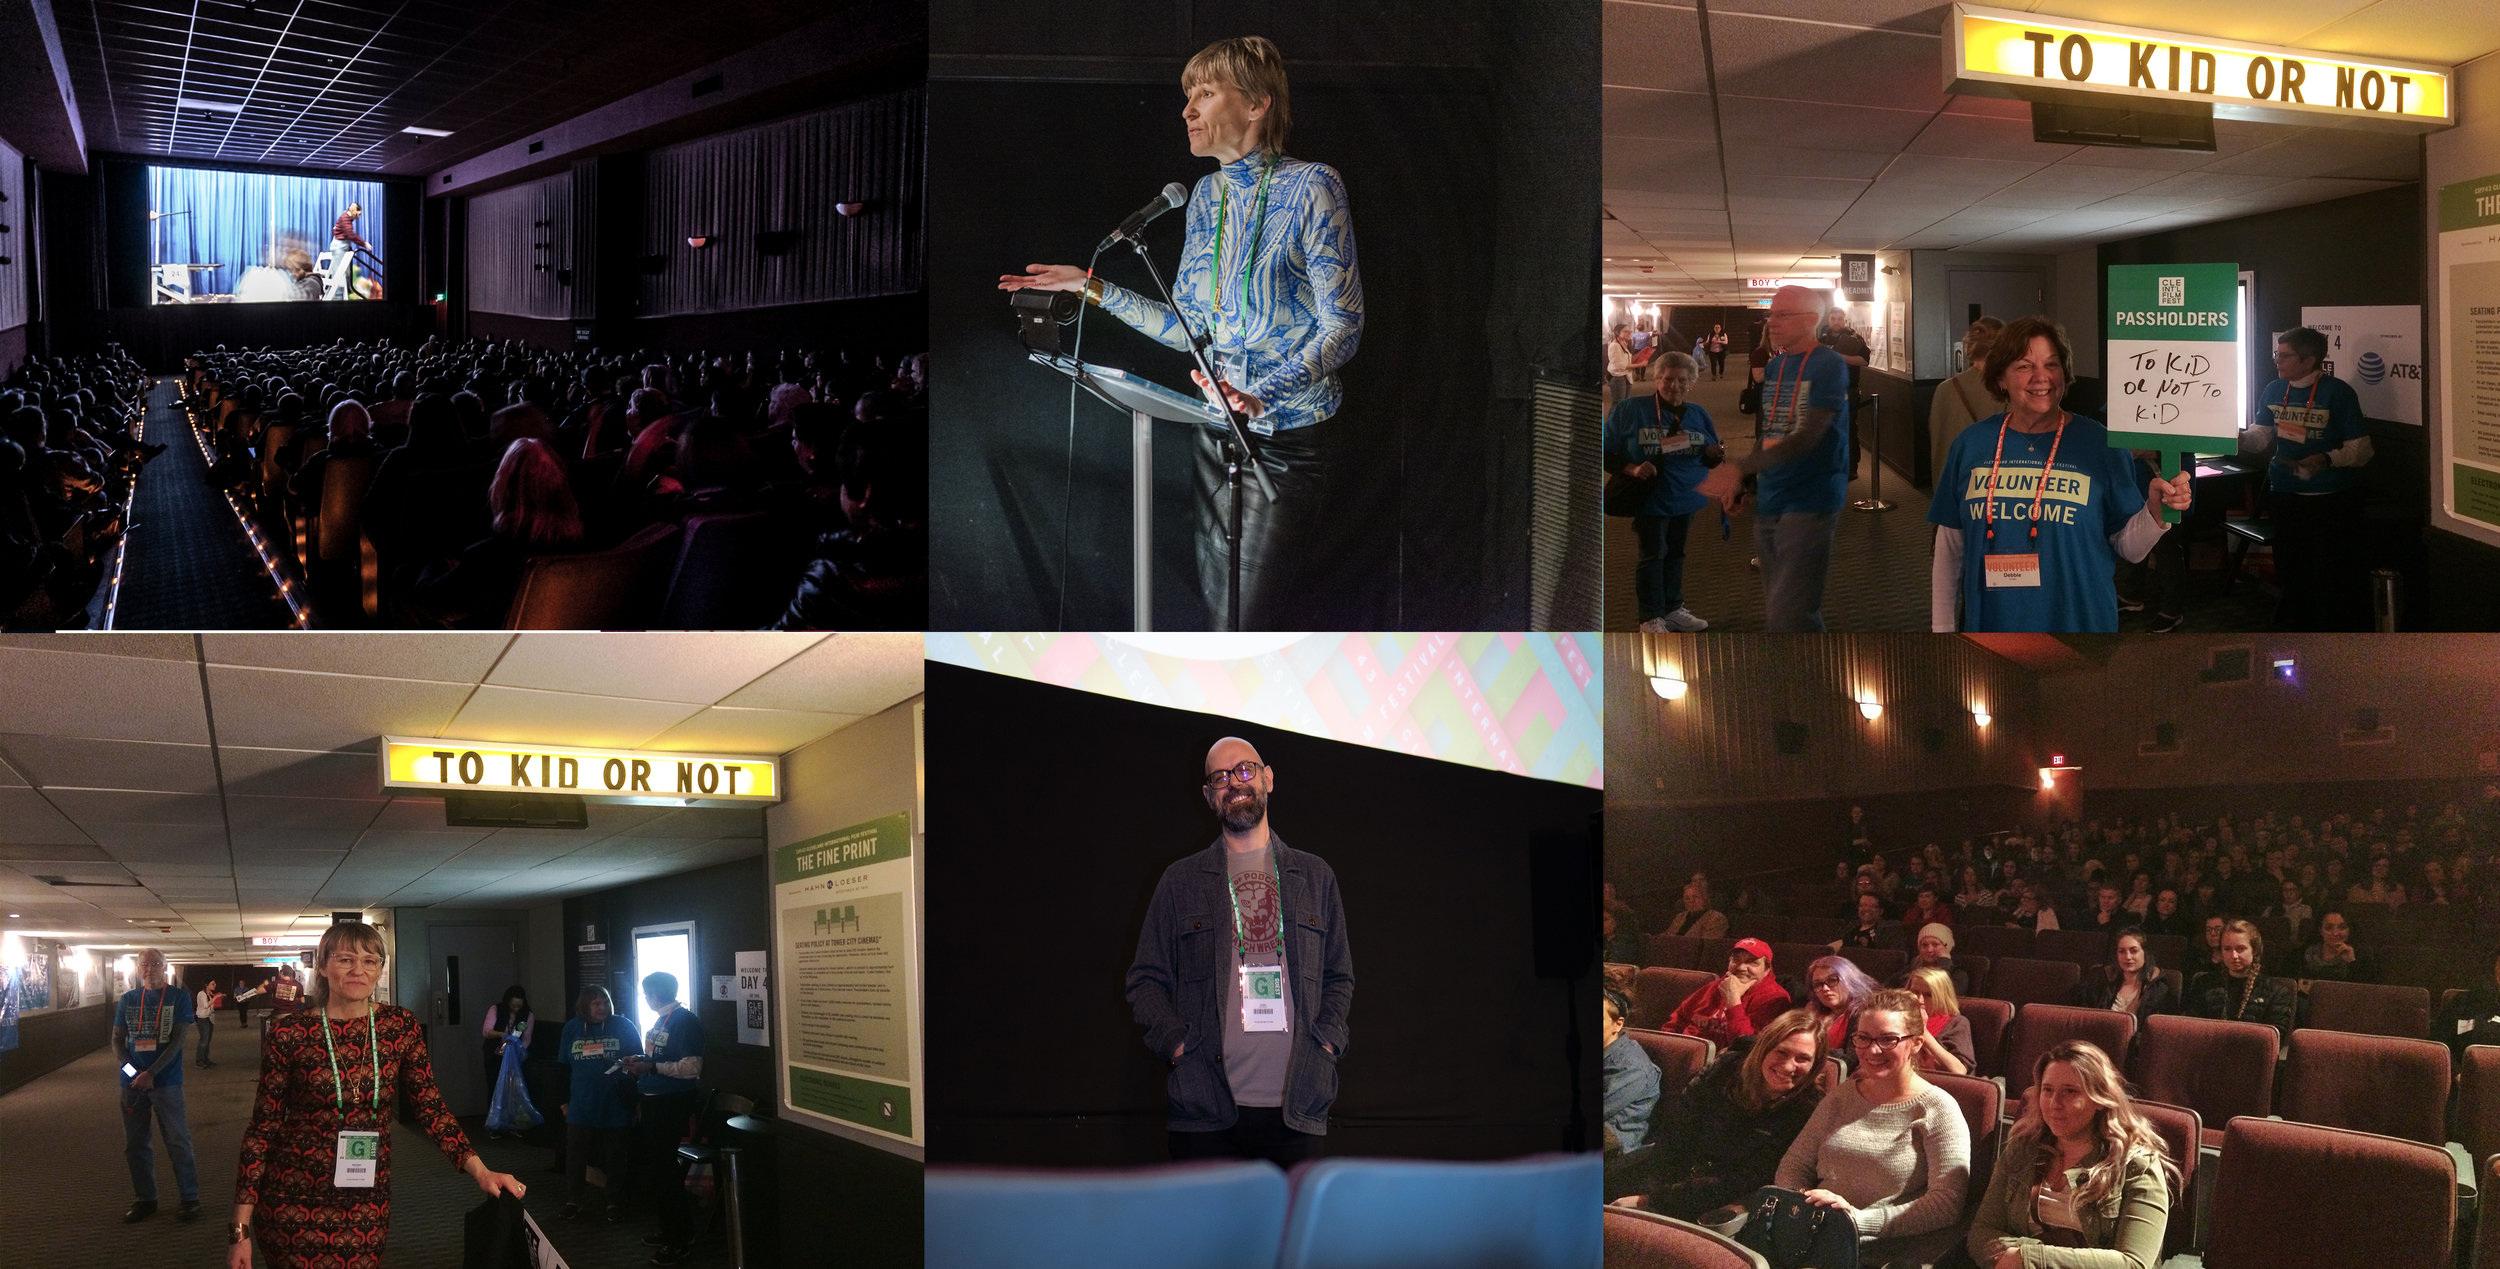 Cleveland film festival screening photos